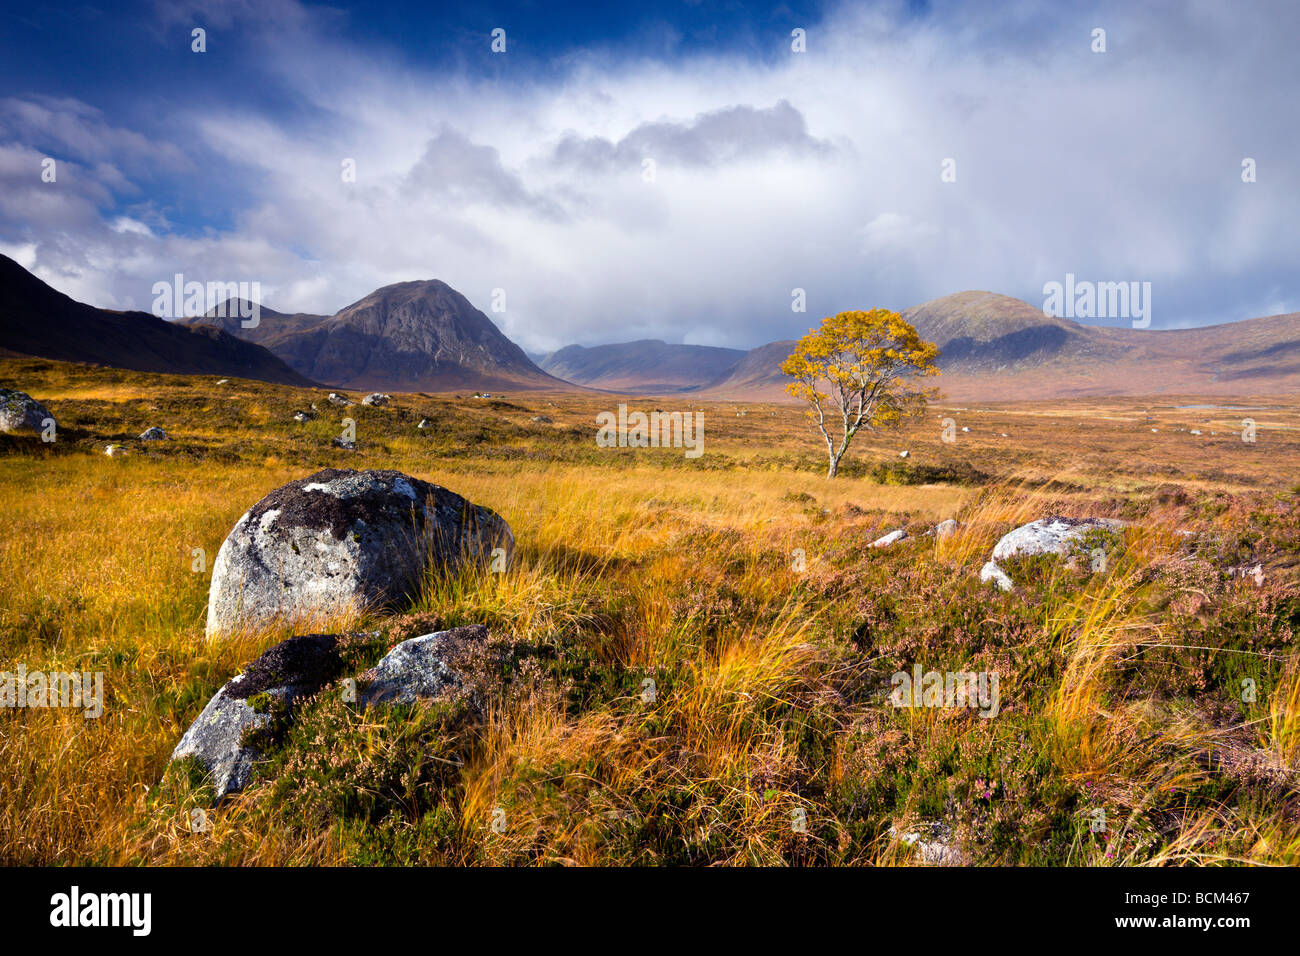 Herbstfarben auf Rannoch Moor Highlands Schottland Oktober 2008 Stockbild